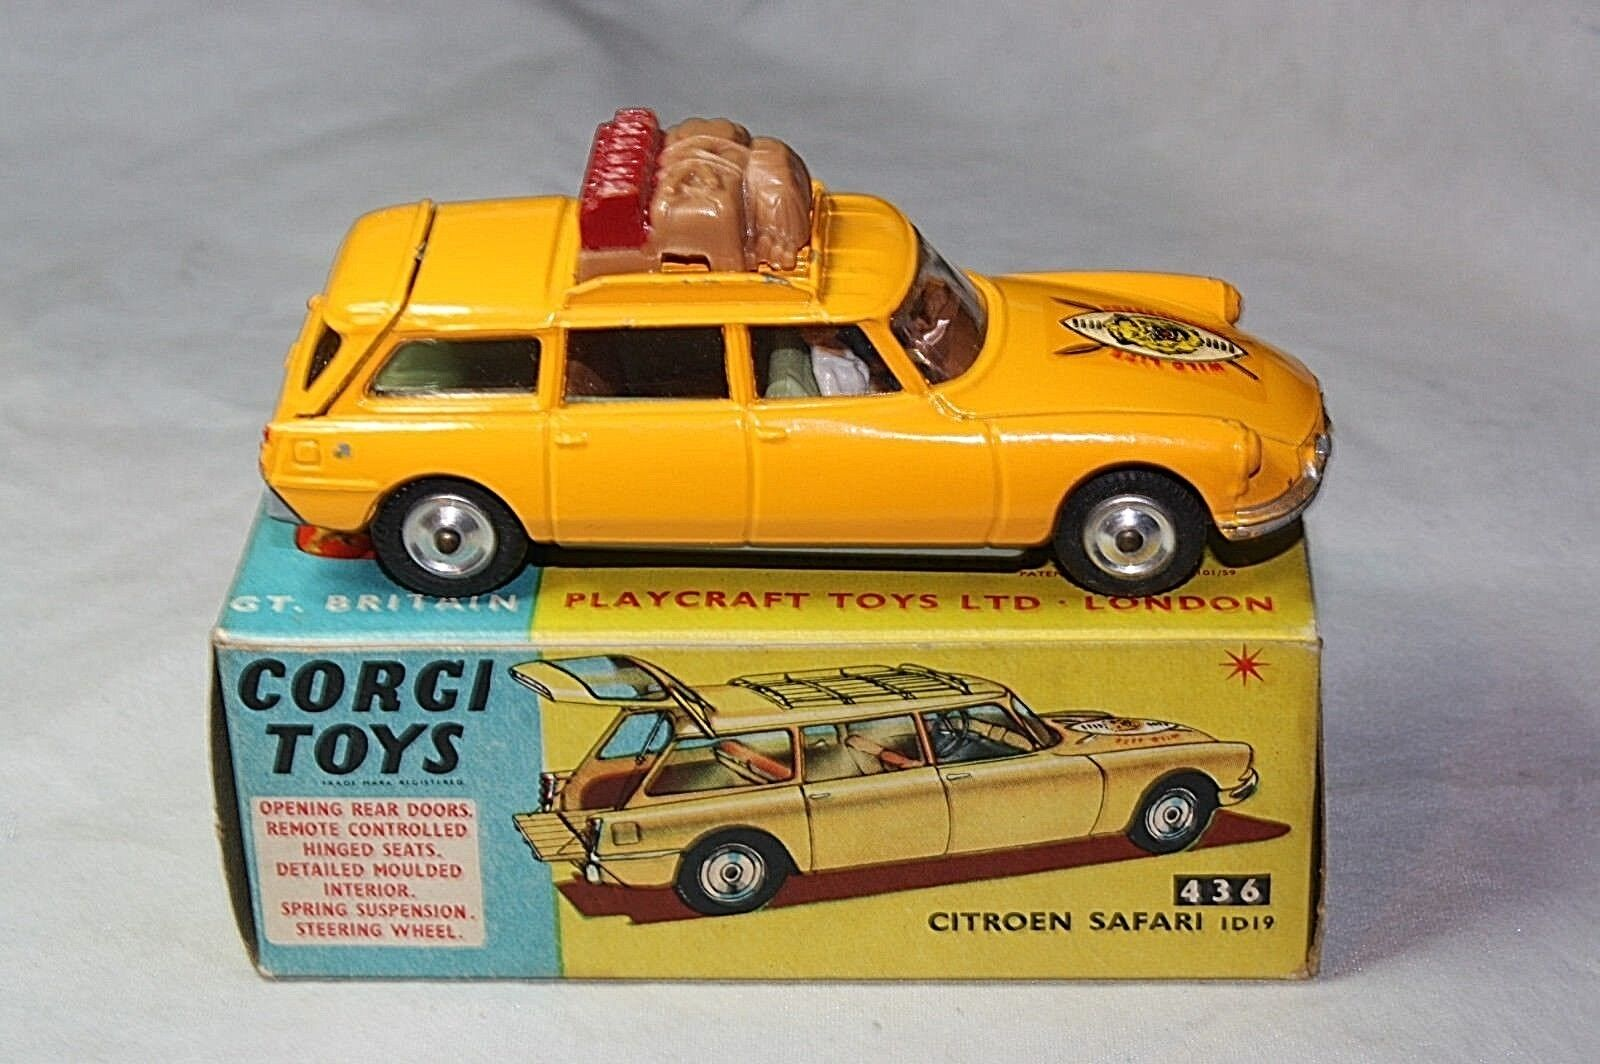 Corgi 436 citroen safari - 19, sehr guter zustand in original - box